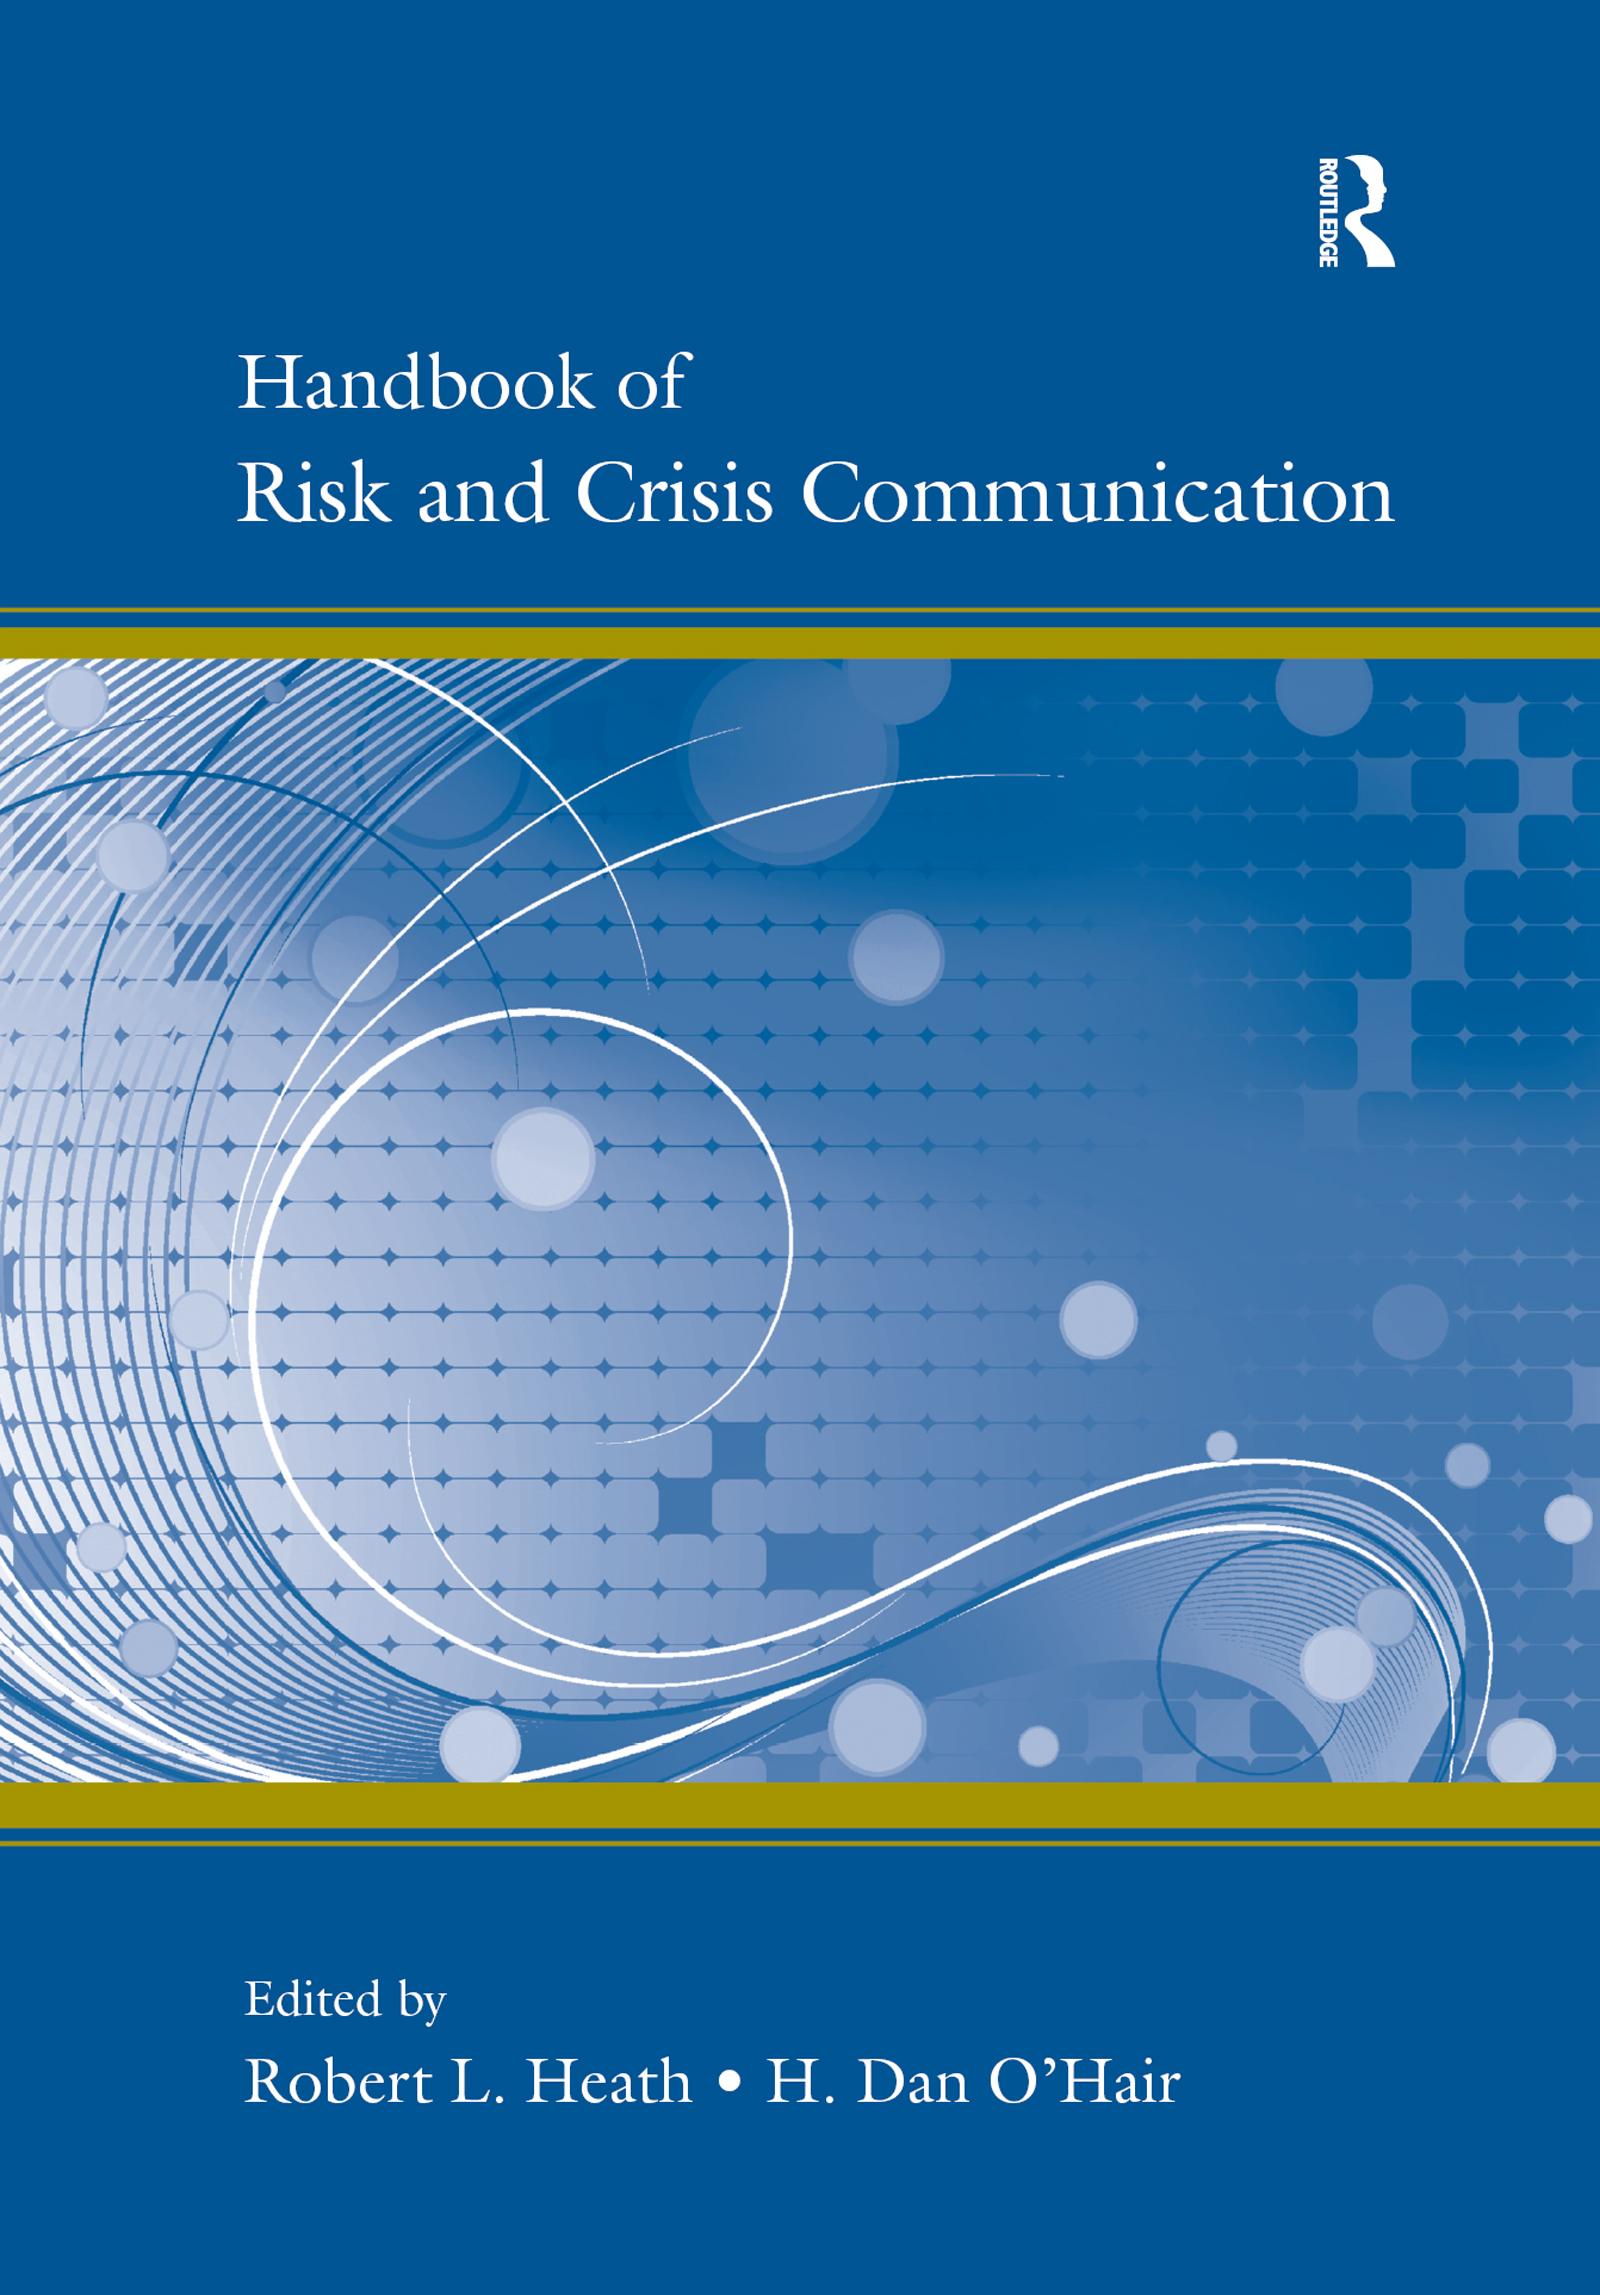 Risk Communication by Organizations: The Back Story